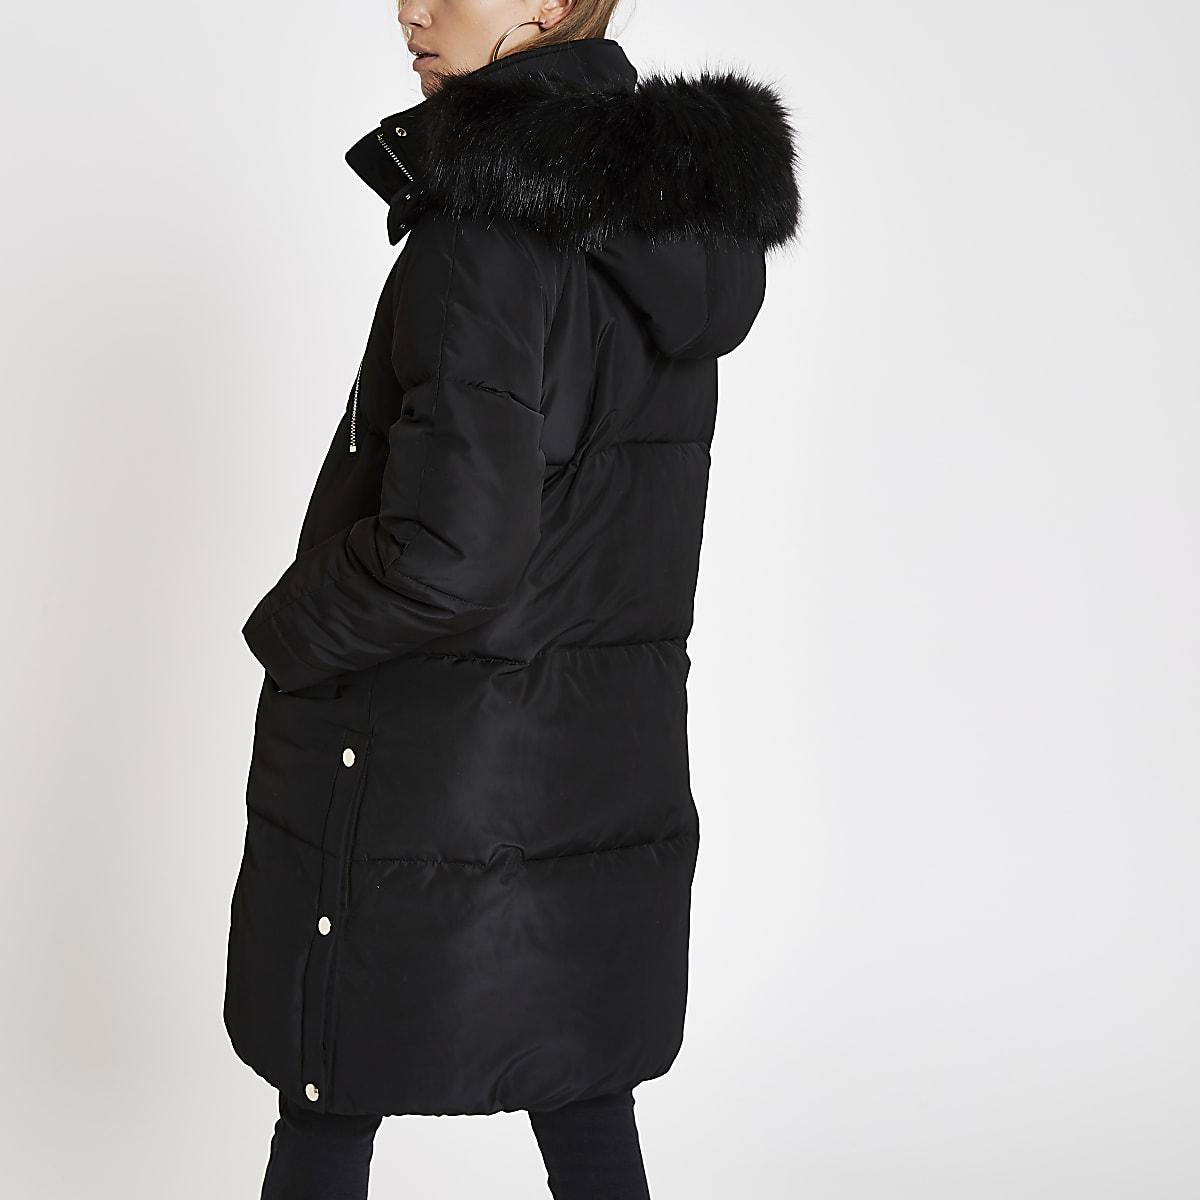 2723e9e5441 Black faux fur trim longline puffer jacket